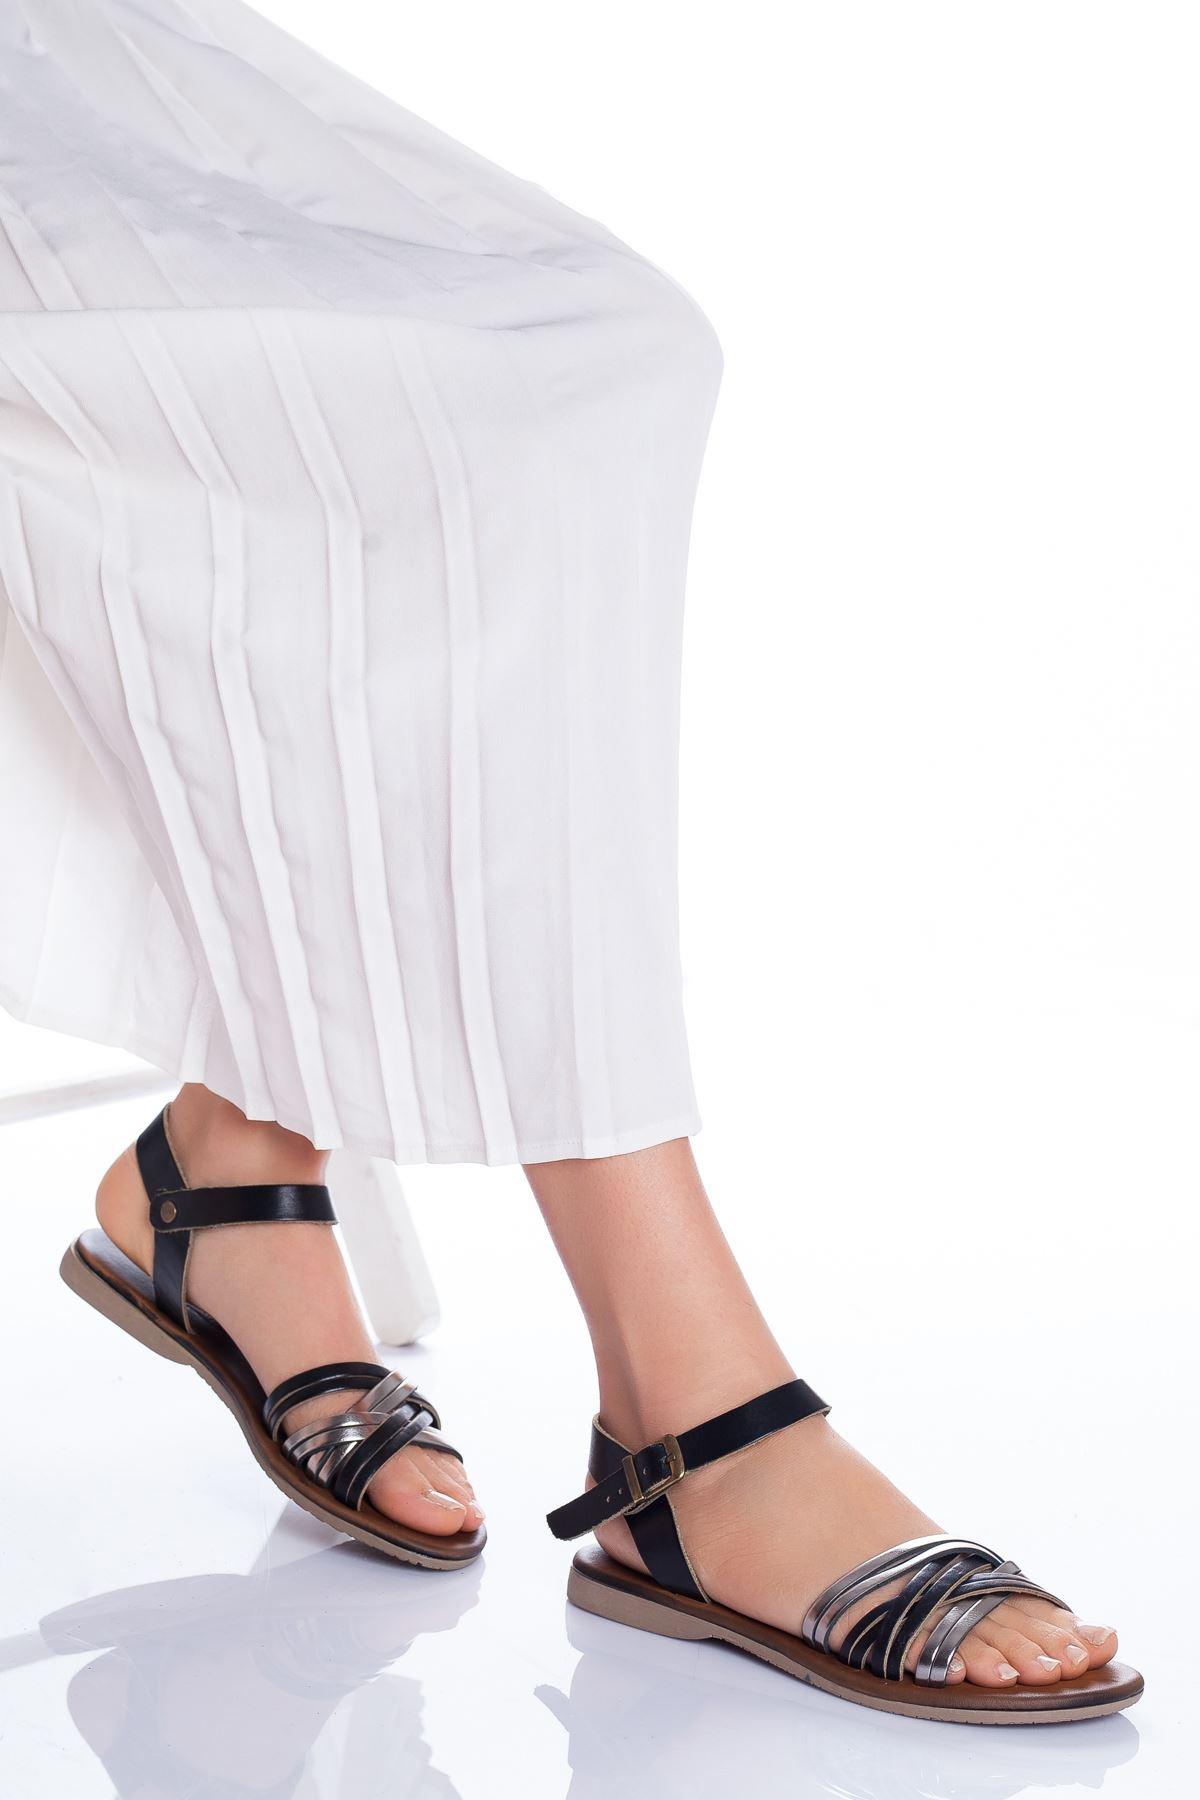 Dorel Hakiki Deri Sandalet SIYAH